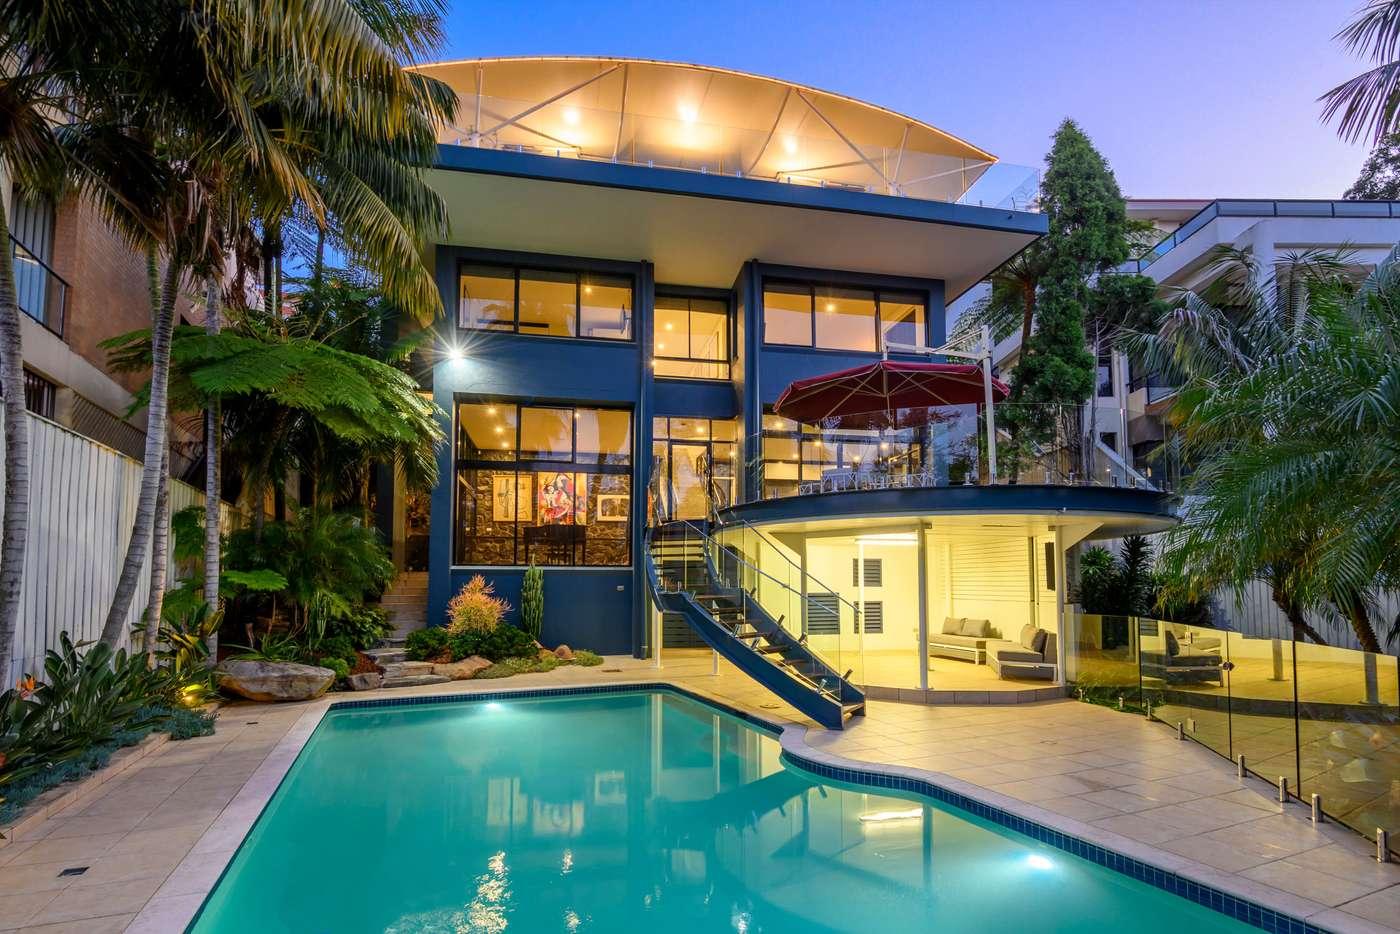 Main view of Homely house listing, 17 Ida Avenue, Mosman NSW 2088